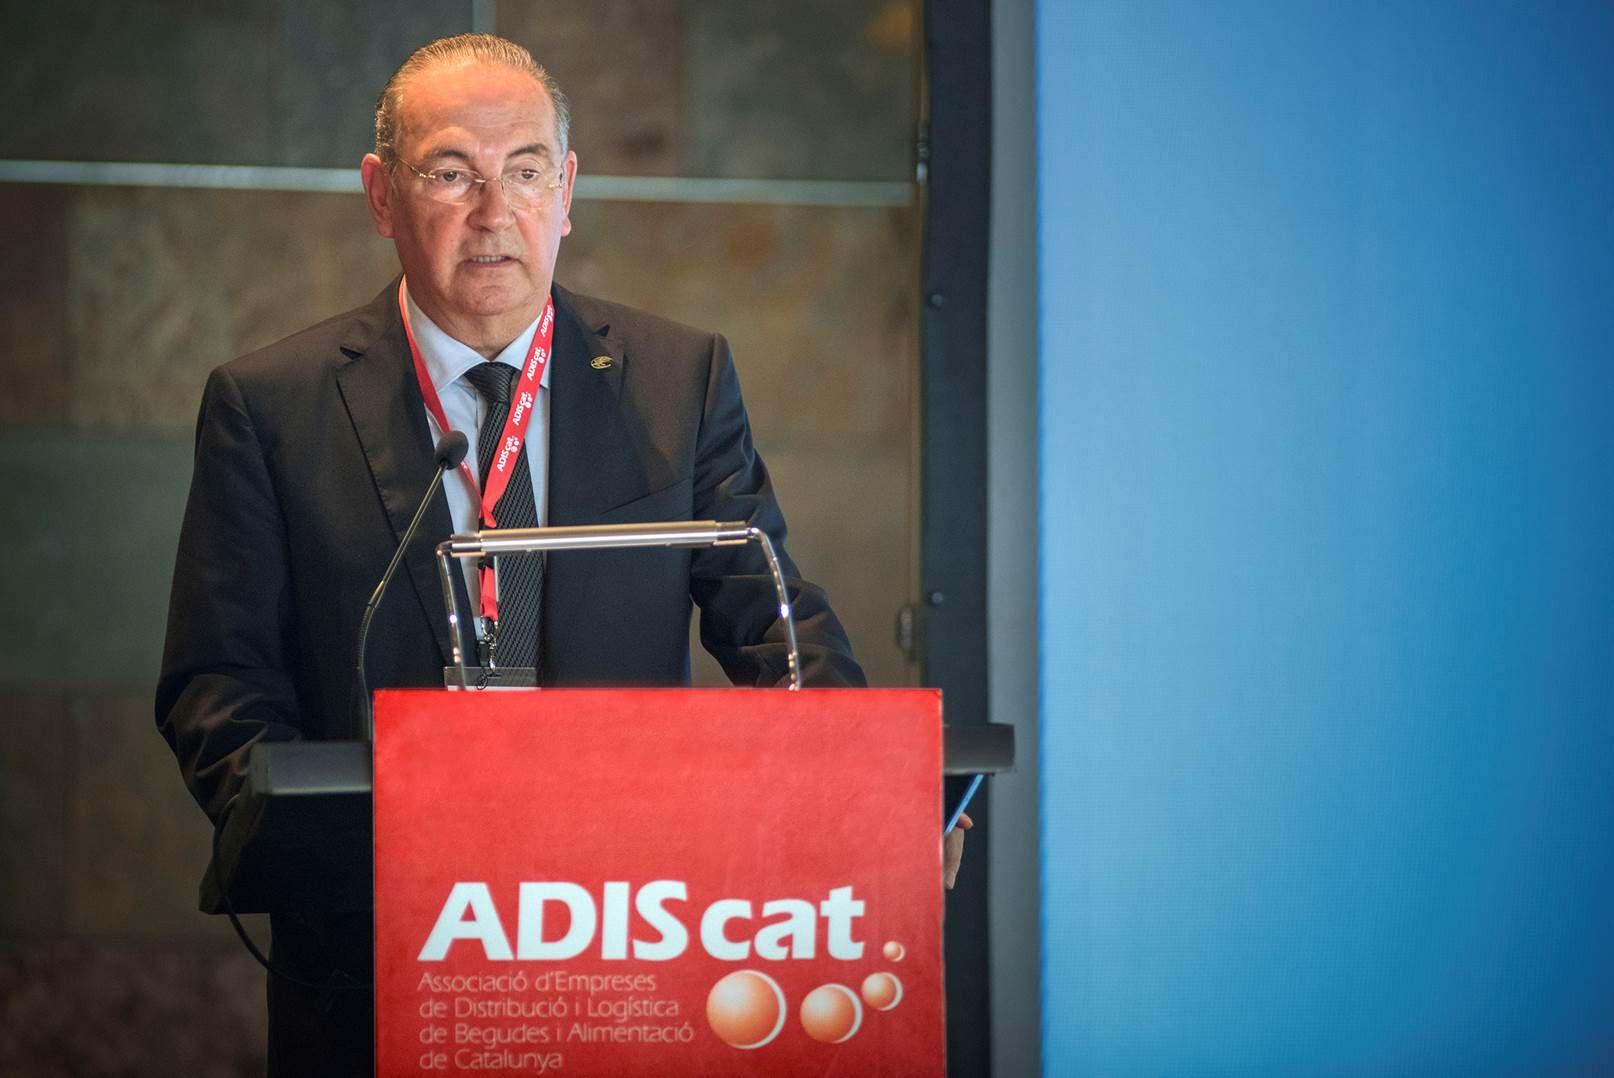 Adiscat reelige como presidente a Jordi Pujol Medina